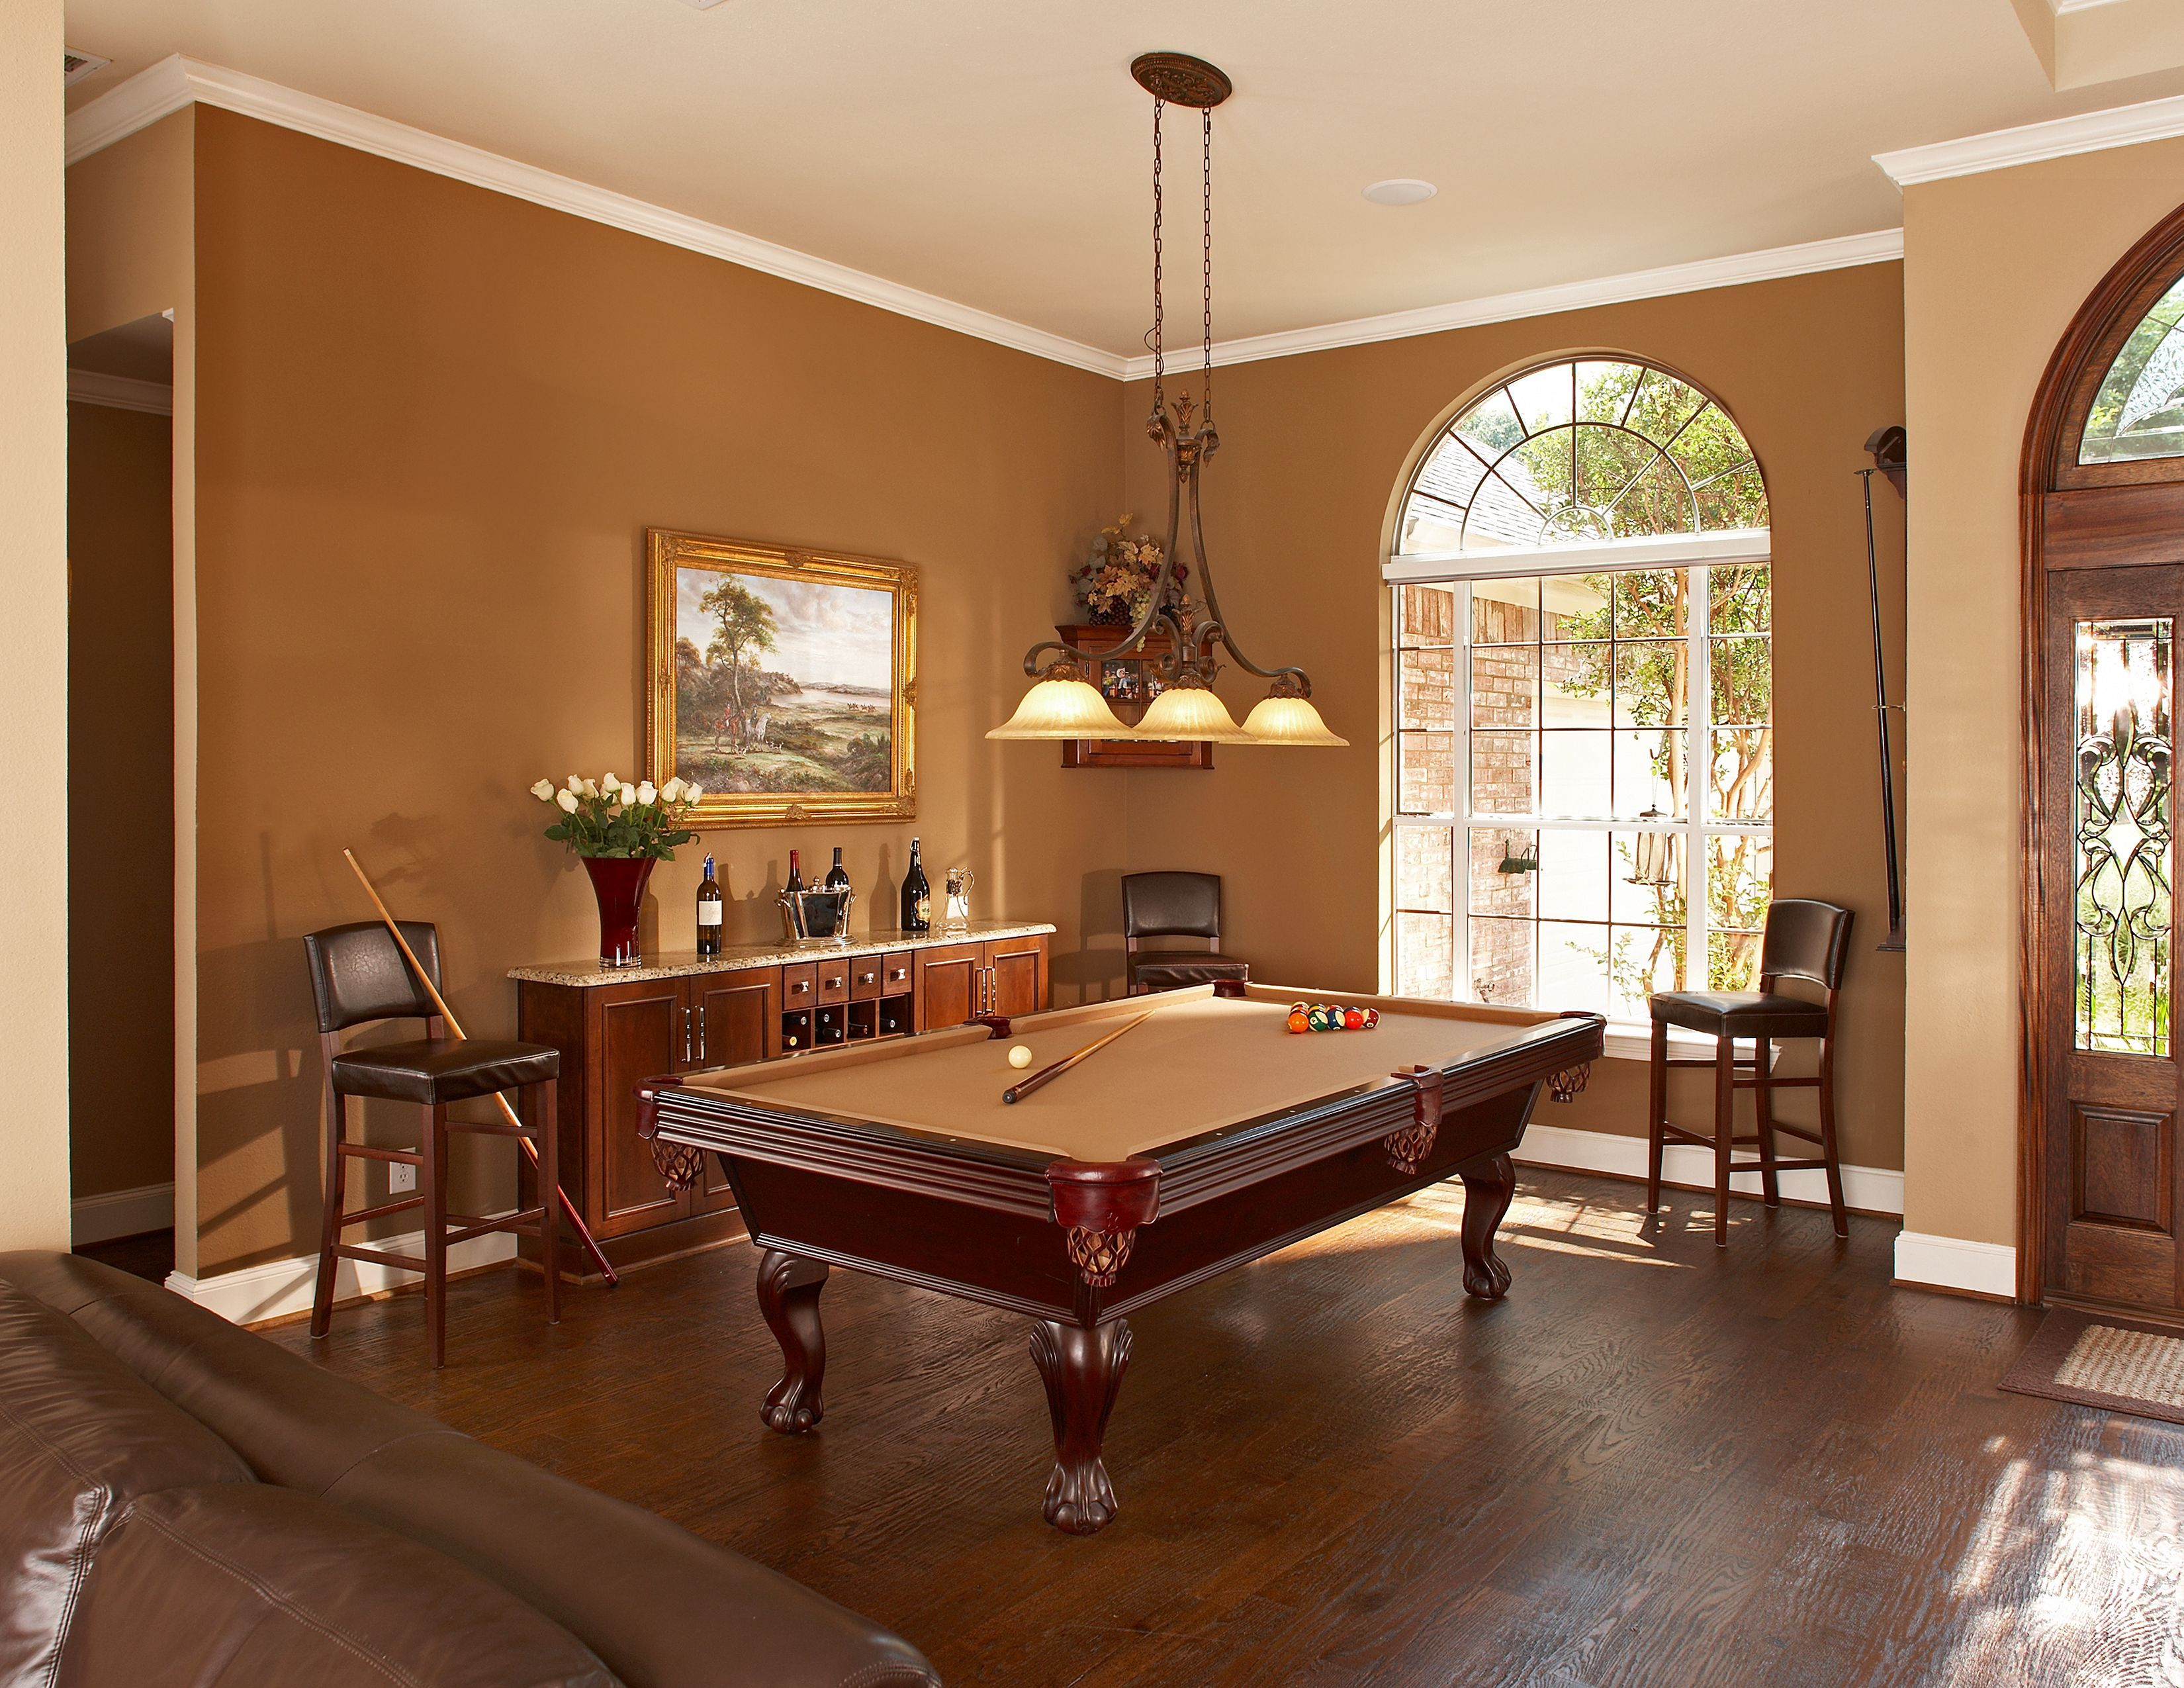 Best Home Addition Designs Pool Table Room Decor Billards 640 x 480